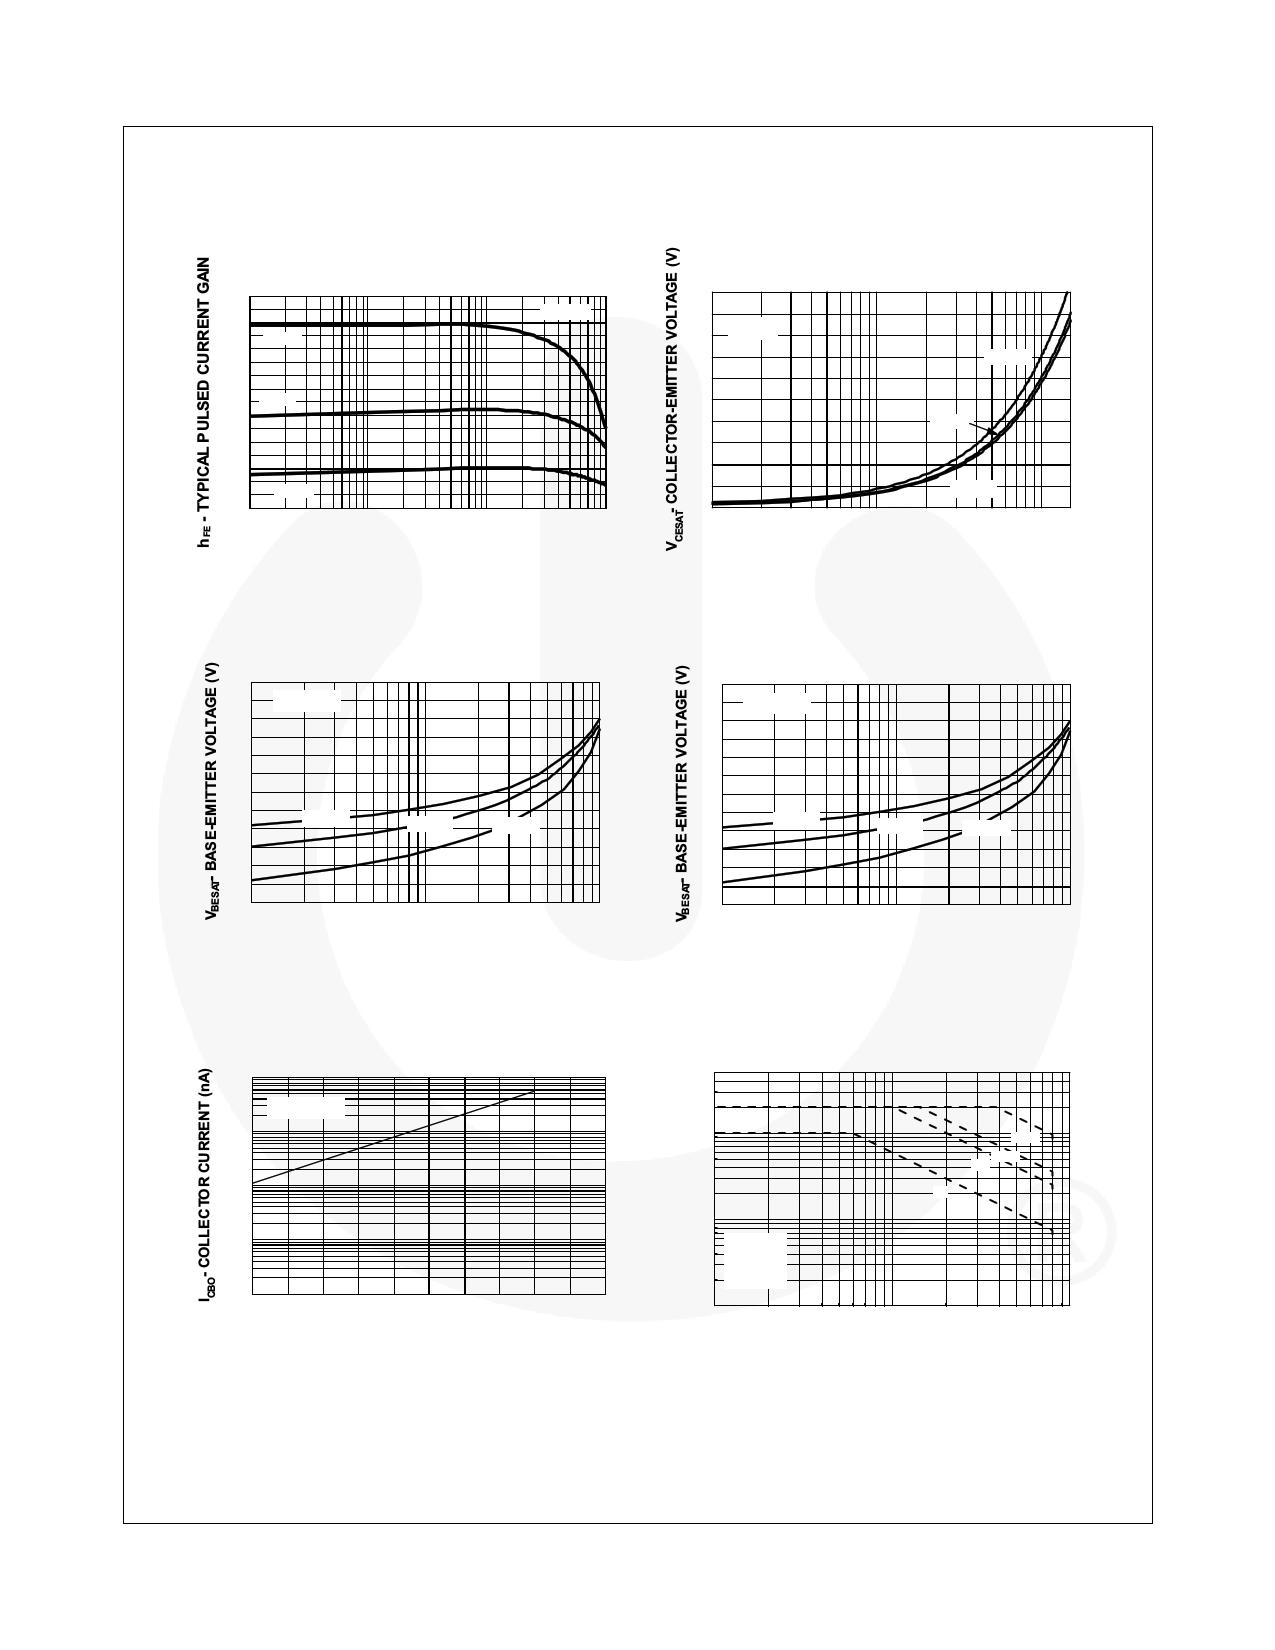 D45H11 pdf, ピン配列